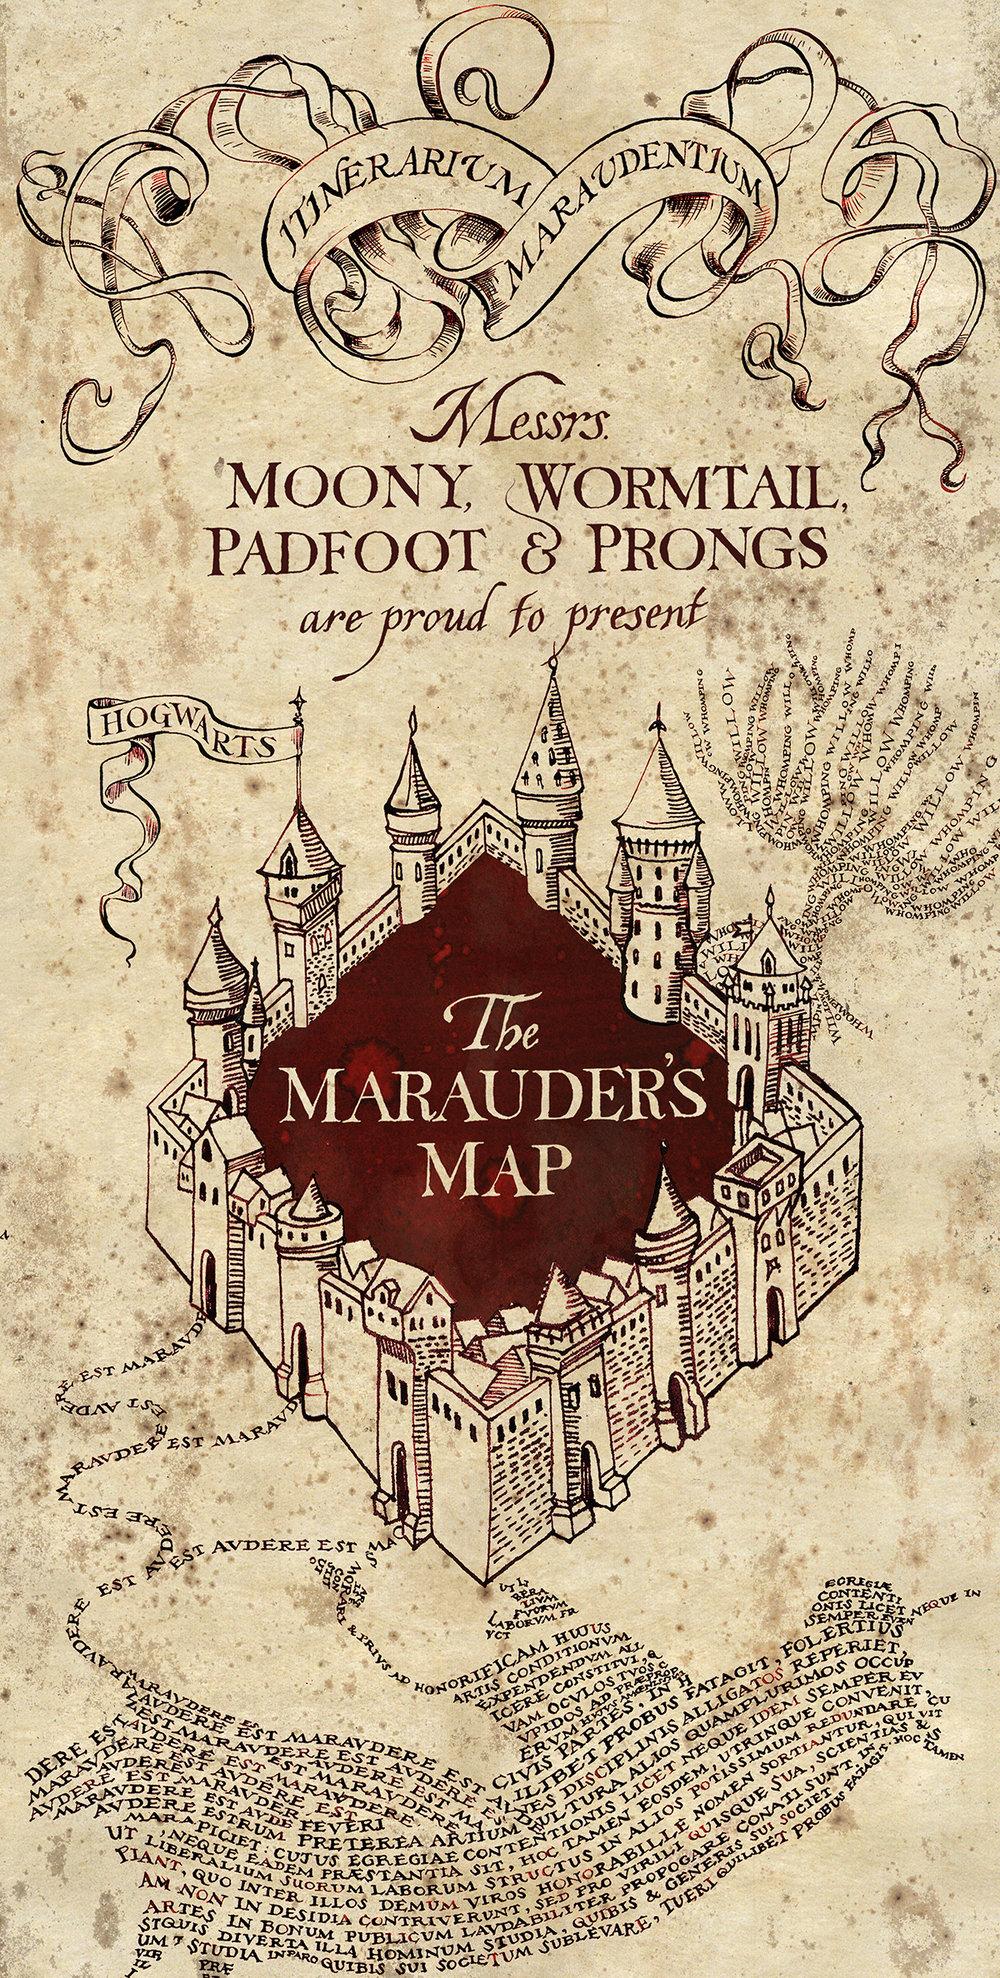 The Marauders Map.jpg